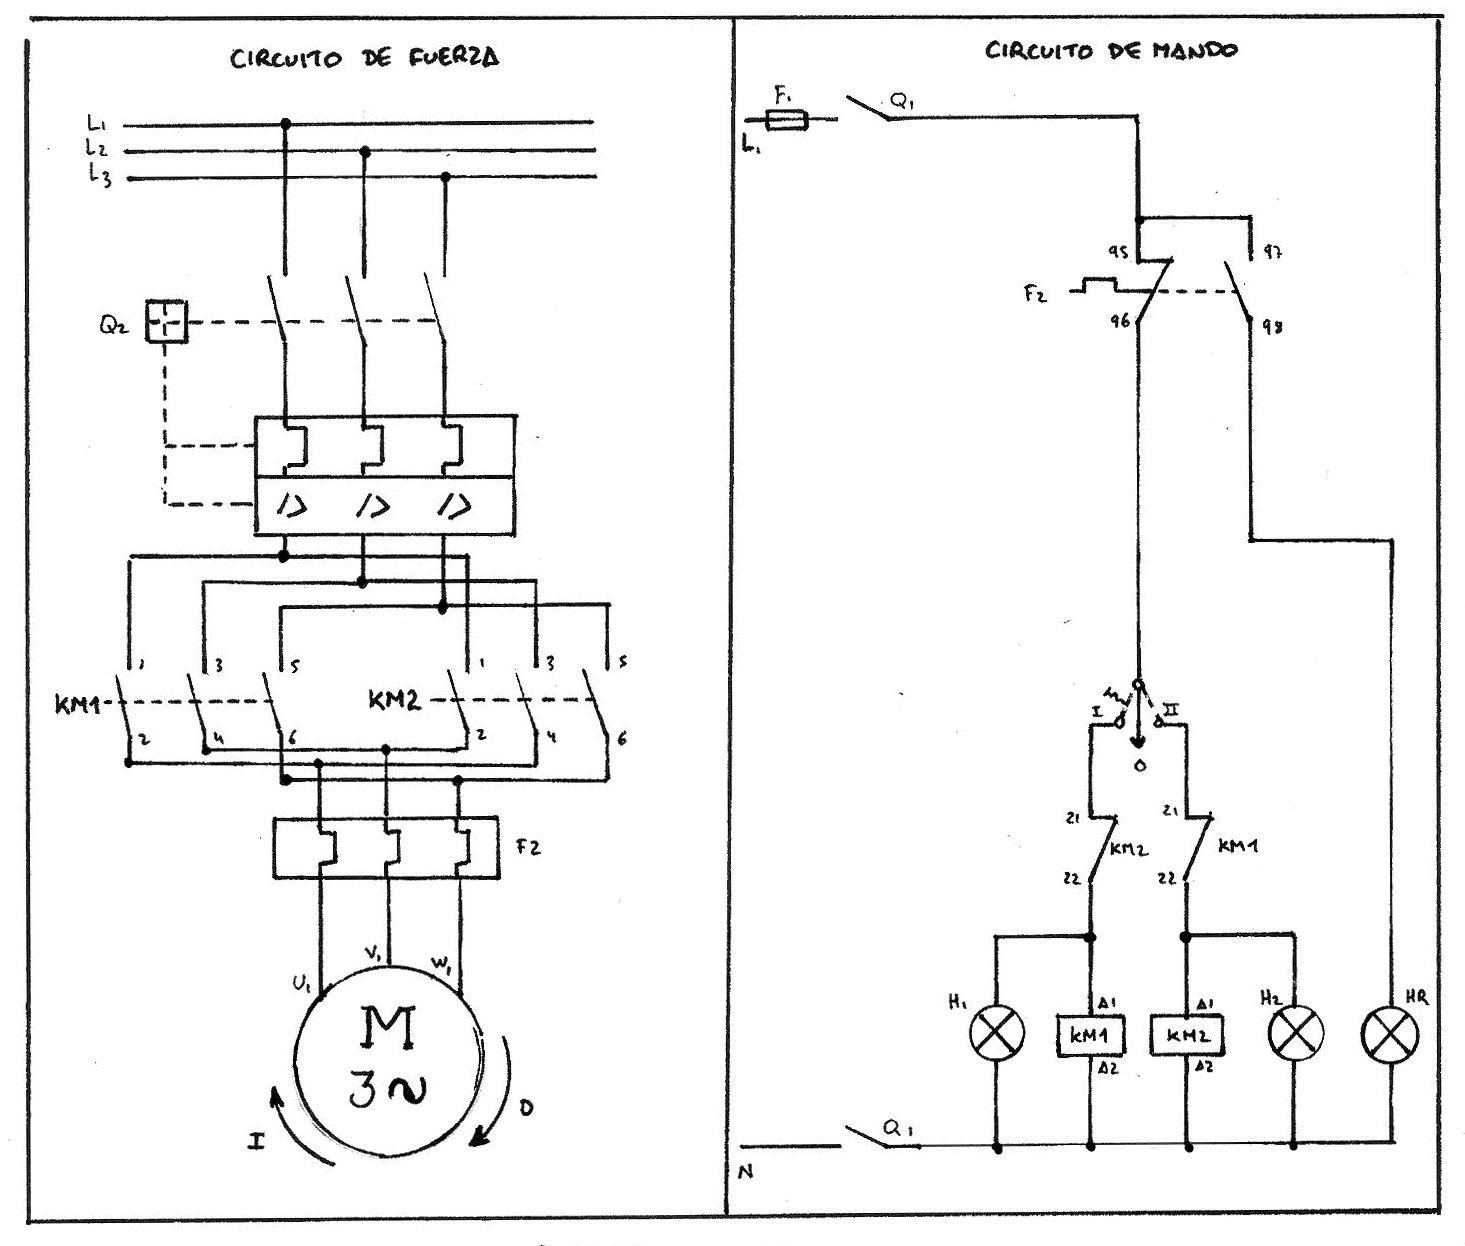 Topcon lm p5 manual pdf